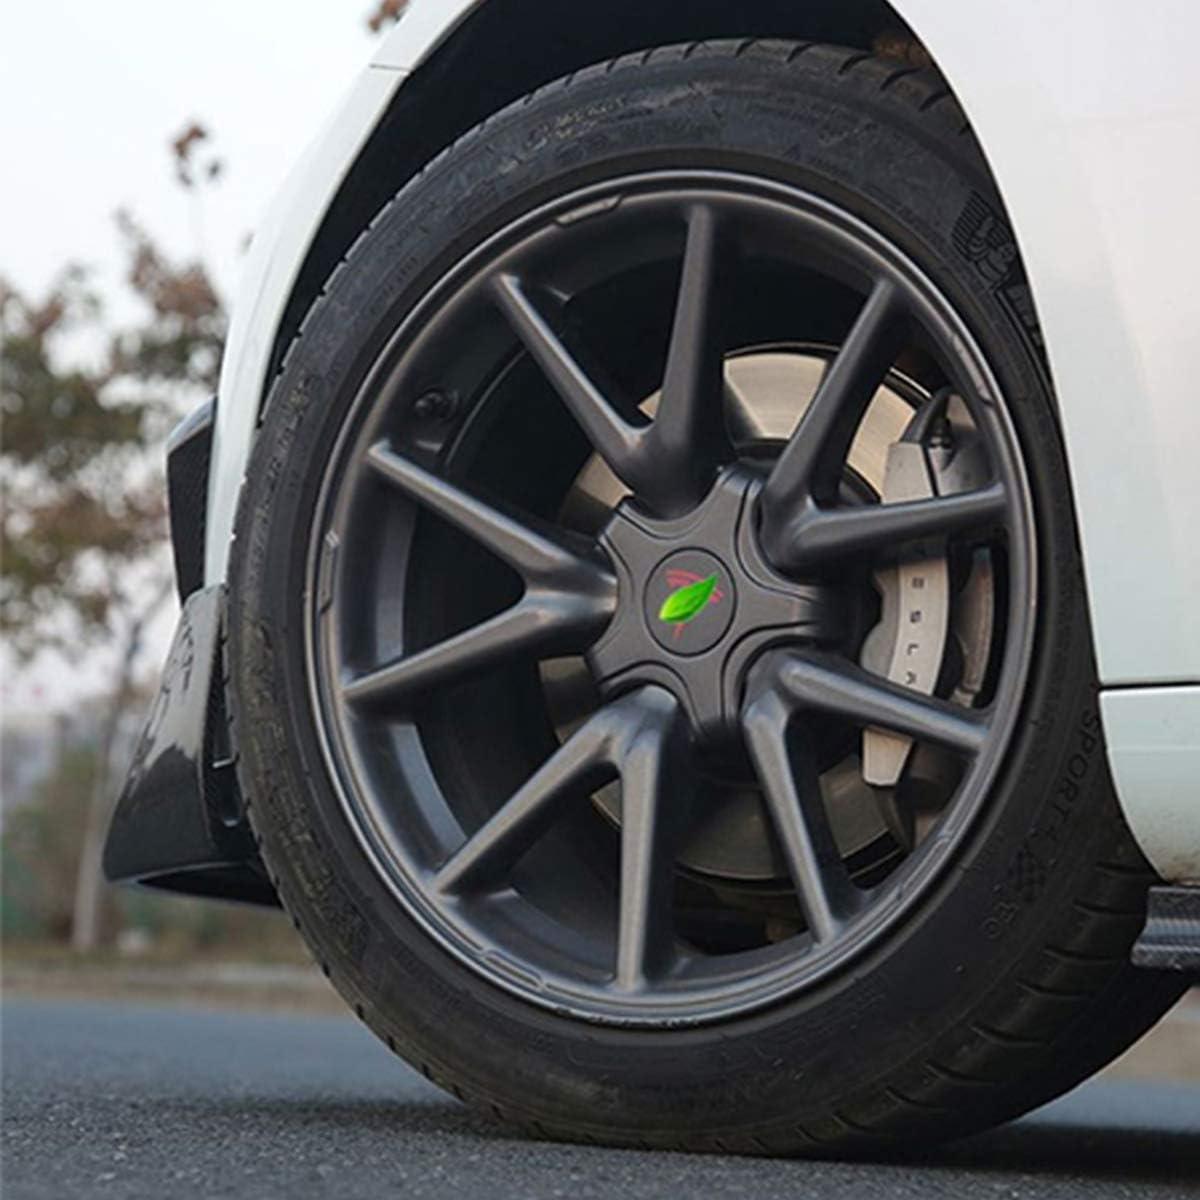 Hub Cover Hubcaps for Tesla Model 3 Center Caps Modification Kit Wheel Cap Kit Dark Gray